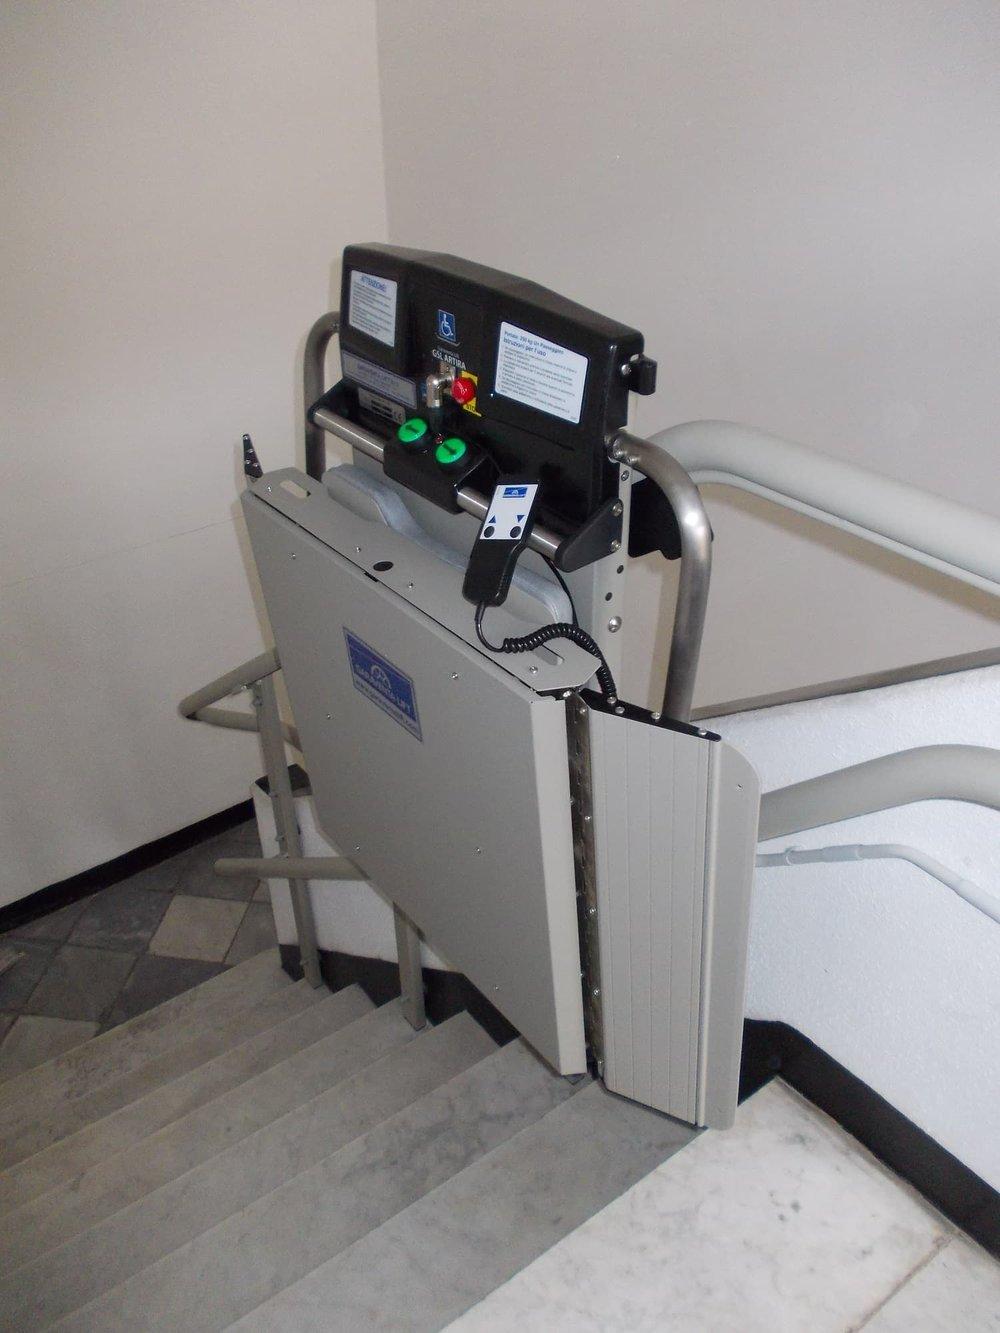 indoor-inclined-platform-wheelchair-access-lift-min.JPG